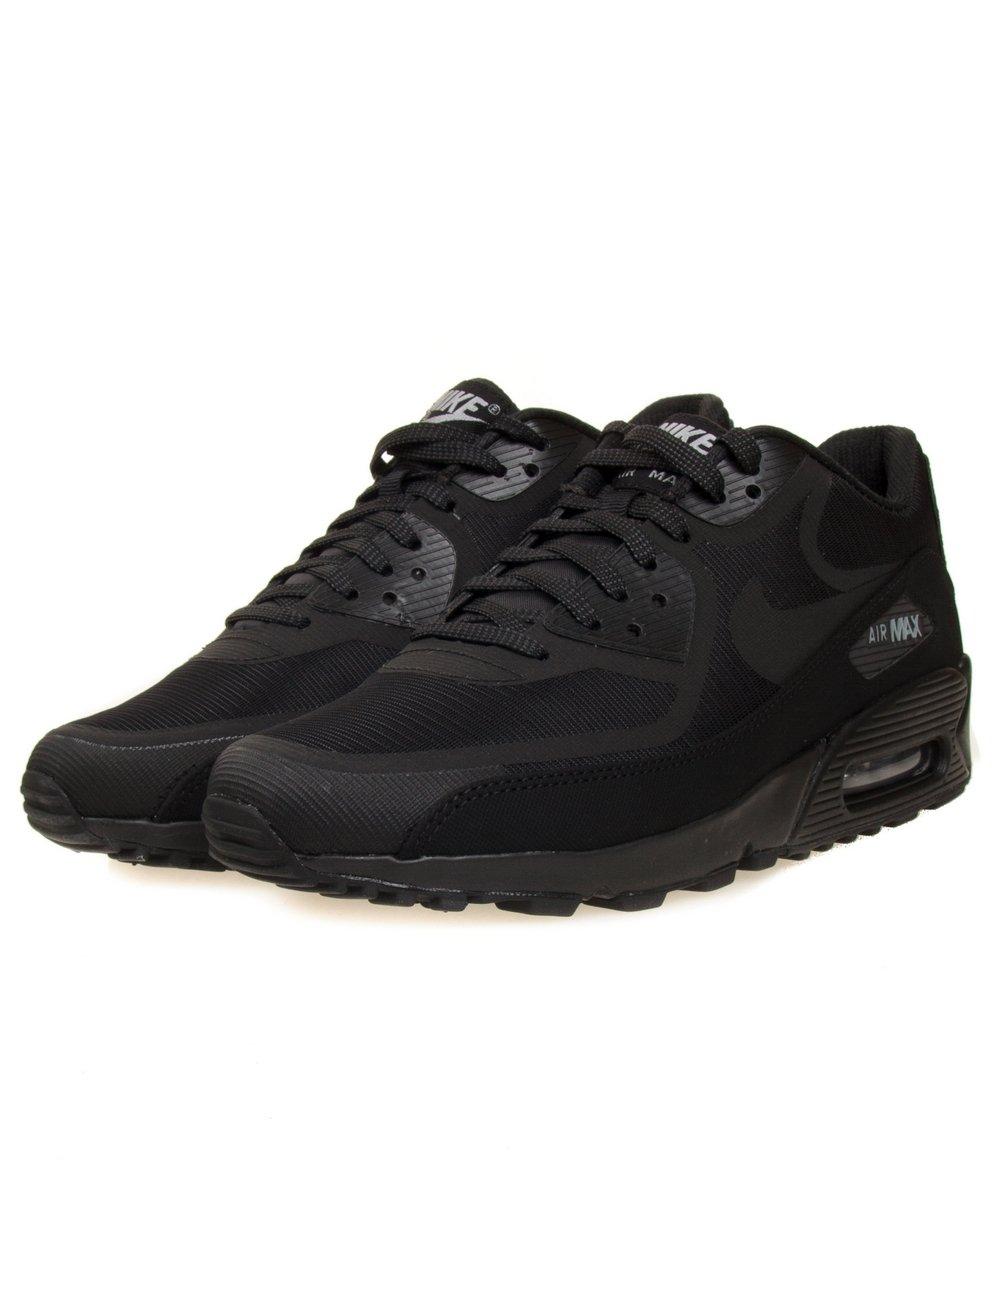 Nike Air Max 90 Cmft Prm Black Black Nike From Fat